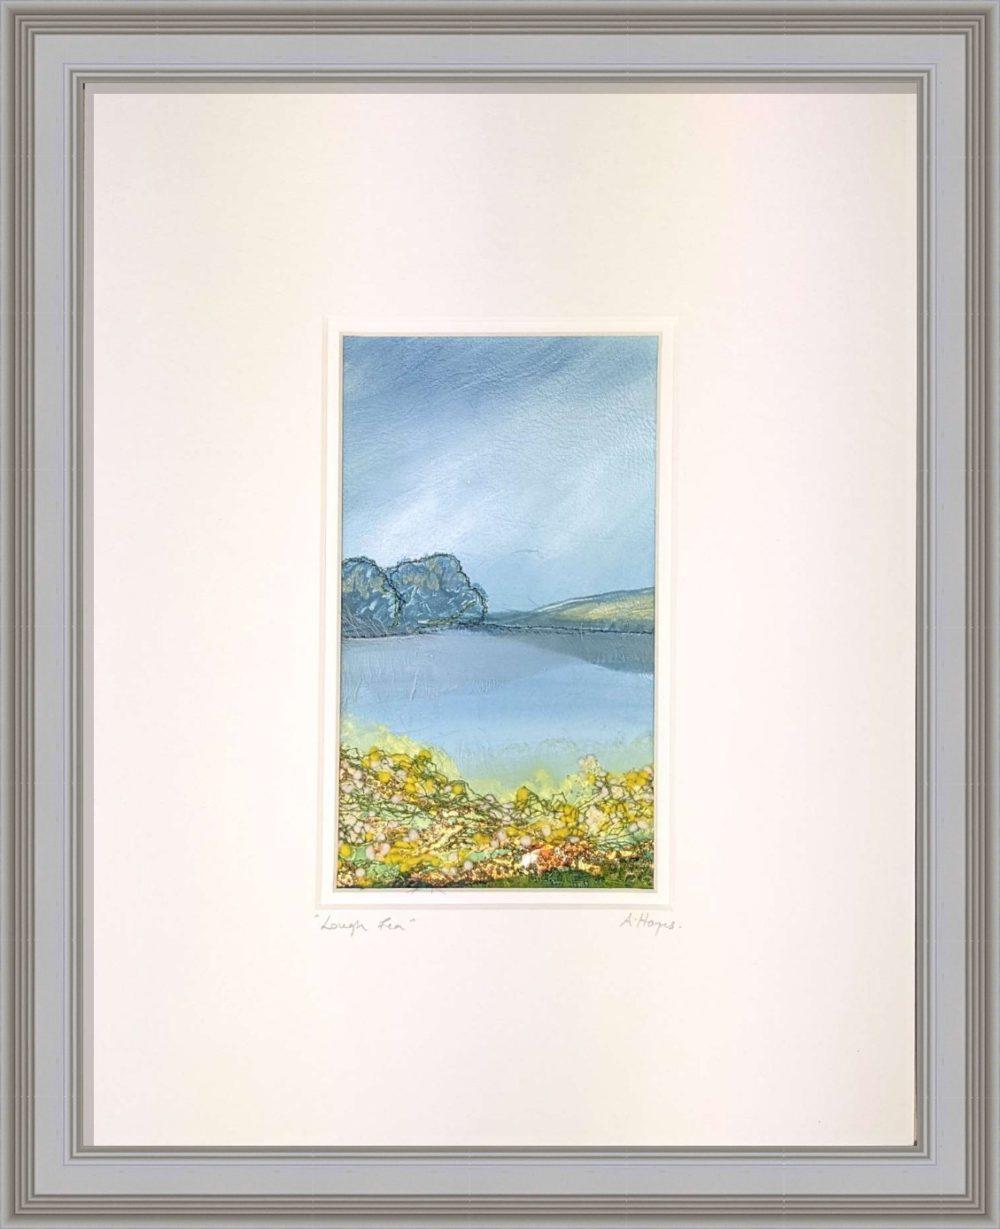 Lough Fea II in Grey Frame